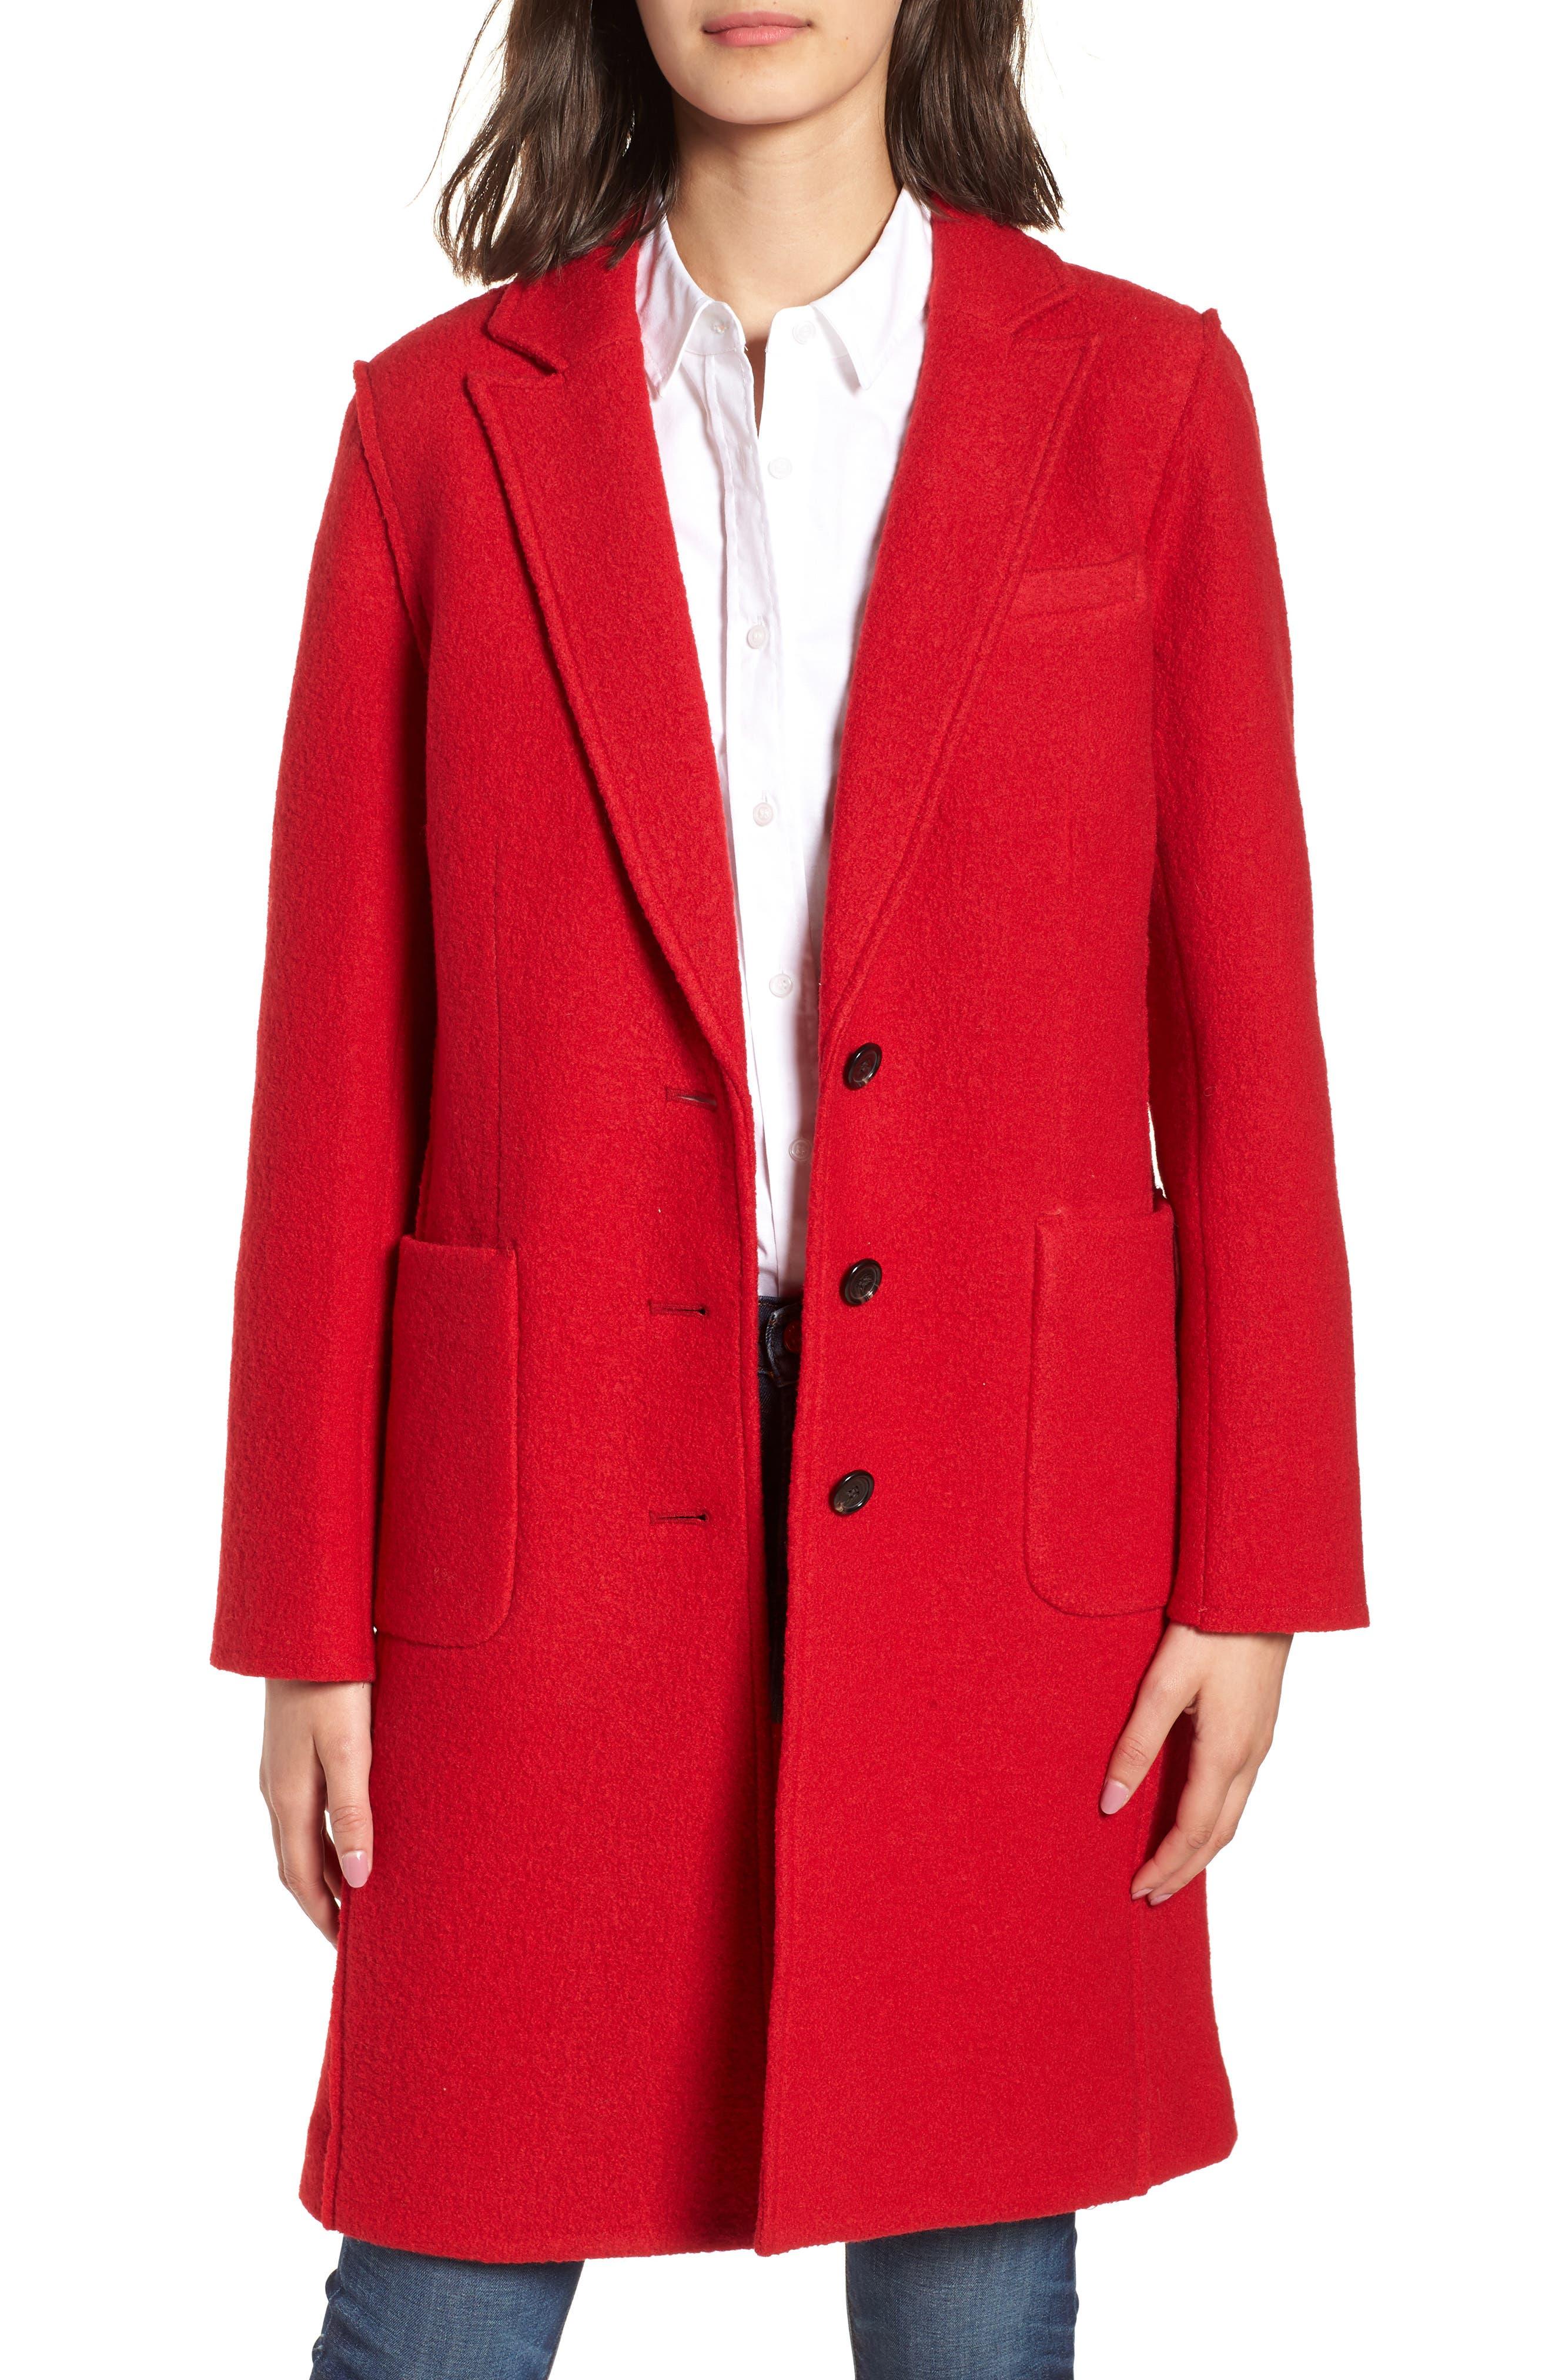 1950s Jackets, Coats, Bolero | Swing, Pin Up, Rockabilly Petite Womens J.crew Olga Boiled Wool Topcoat Size 10P - Red $119.90 AT vintagedancer.com